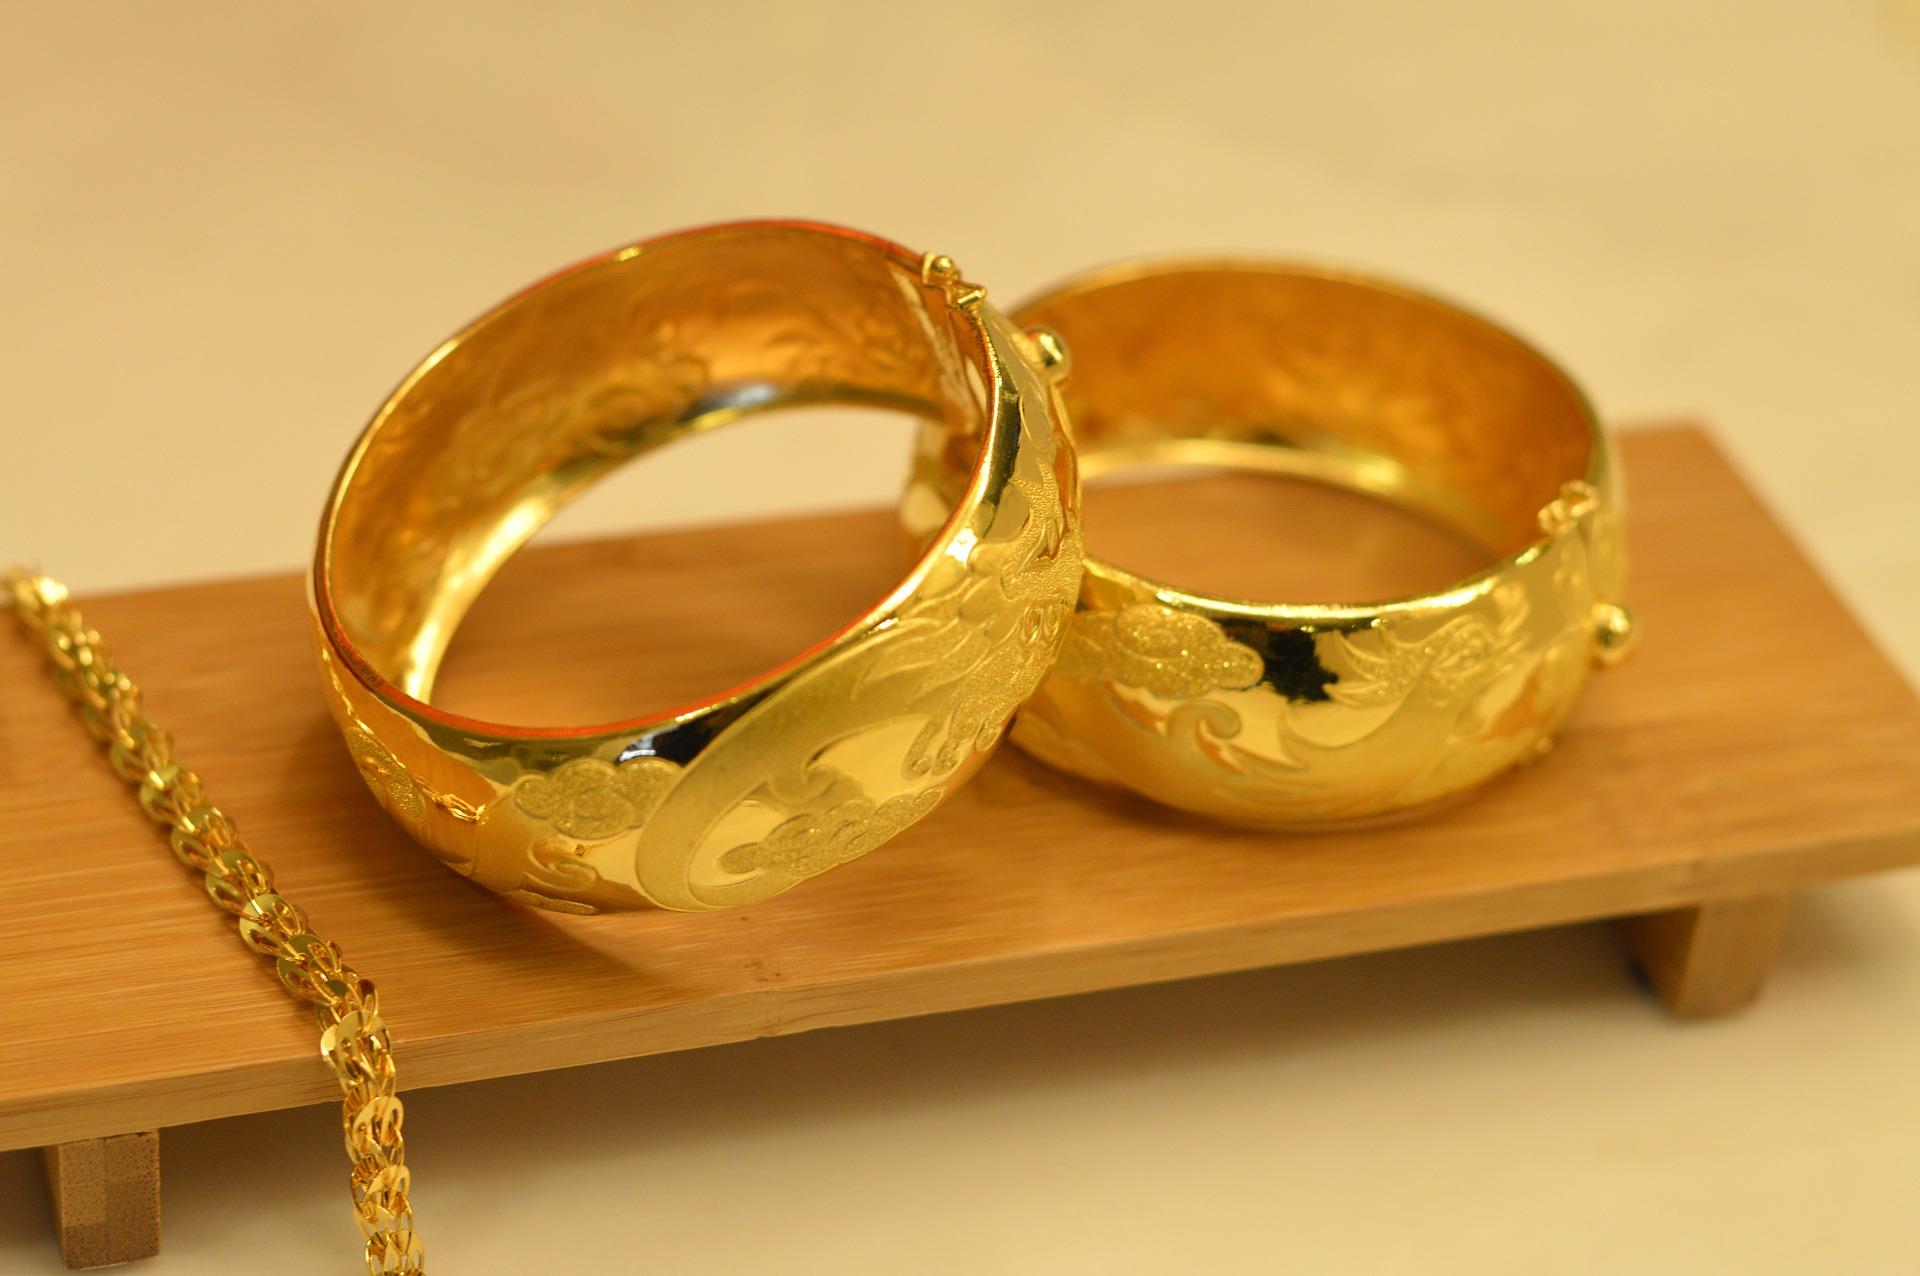 burme od zutog zlata cena